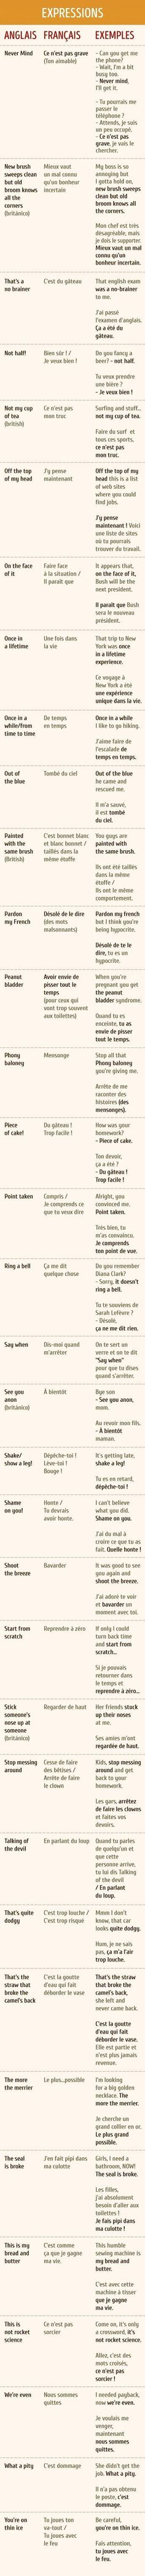 Jecomprends maintenant ceque voulait medire mon prof d'anglais #frenchlessonsfunny